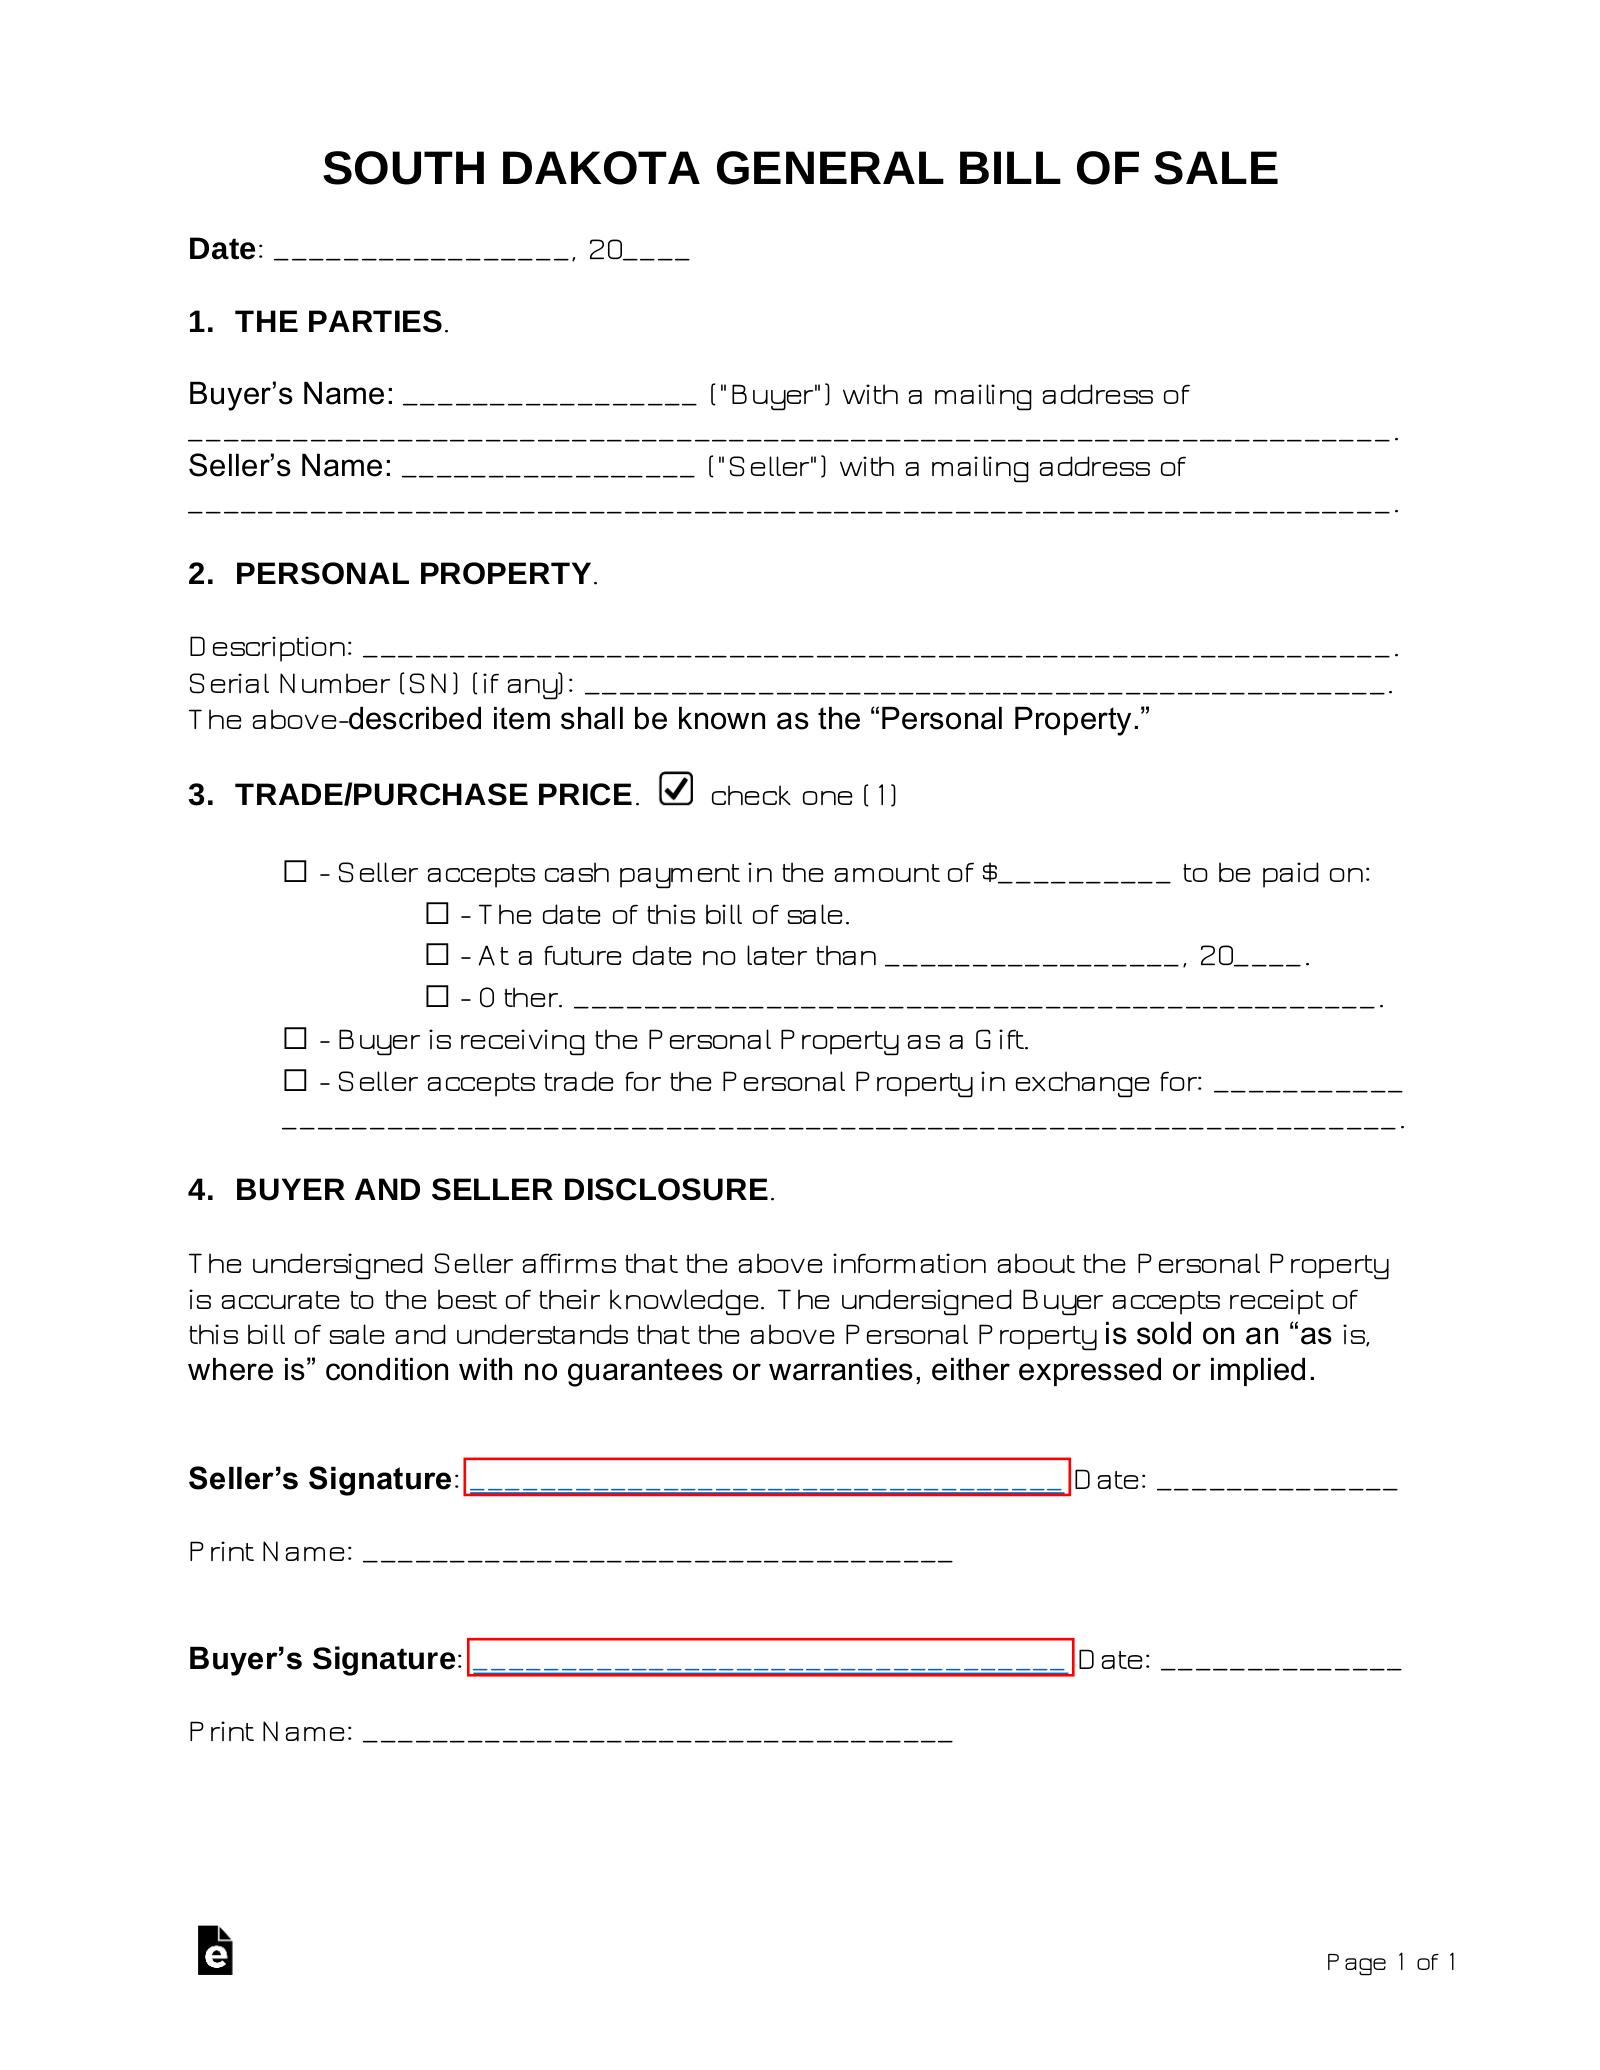 Free South Dakota General Bill Of Sale Form